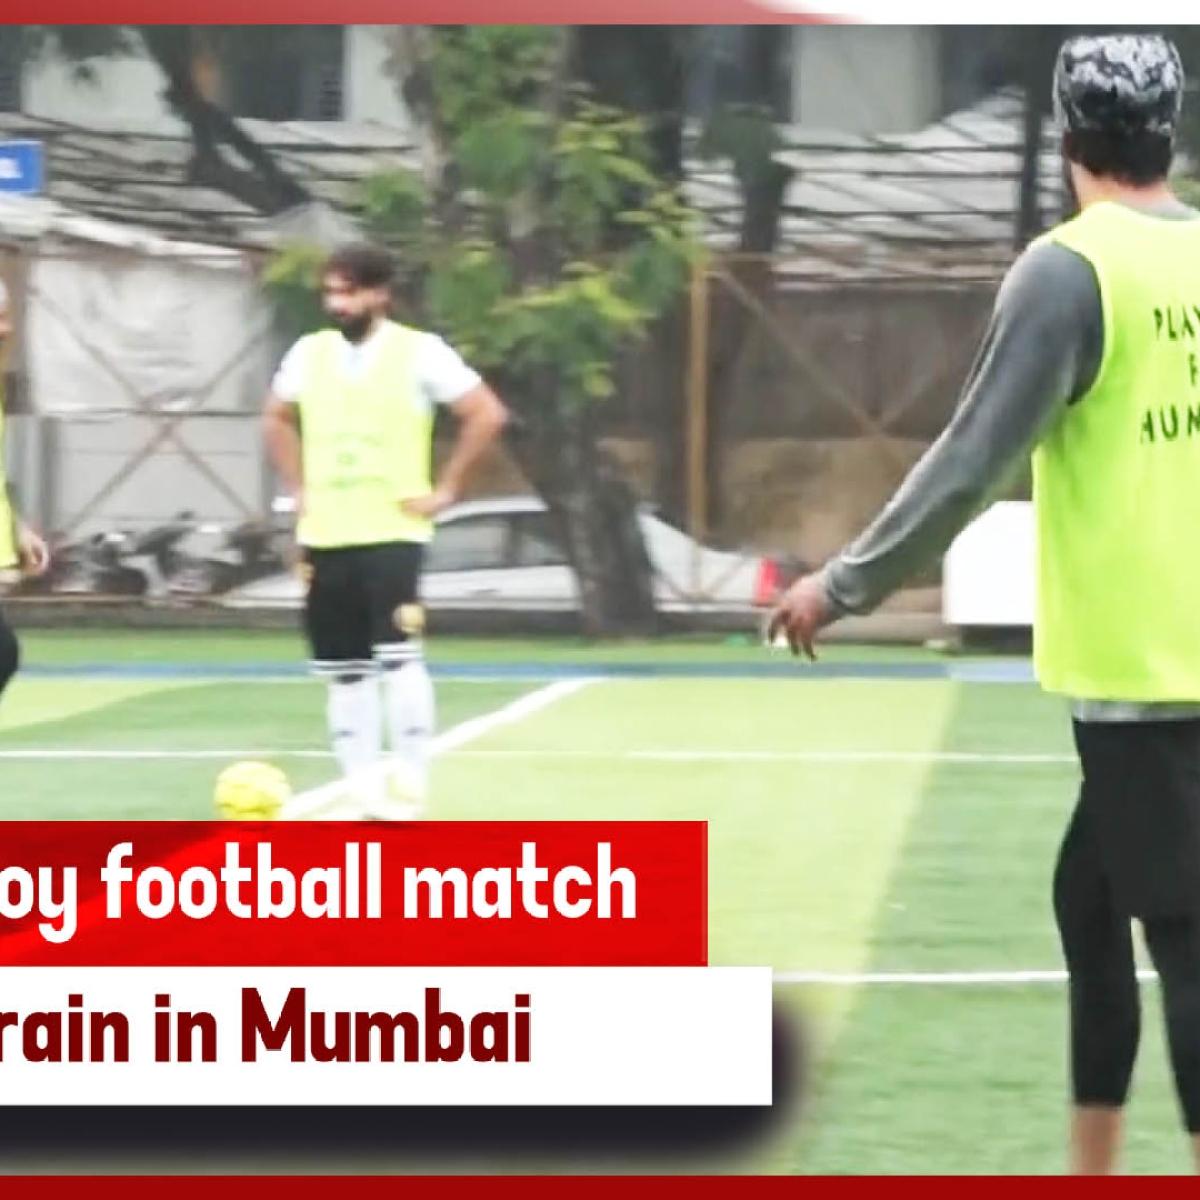 Bollywood Celebs Enjoy Football Match During Rain In Mumbai